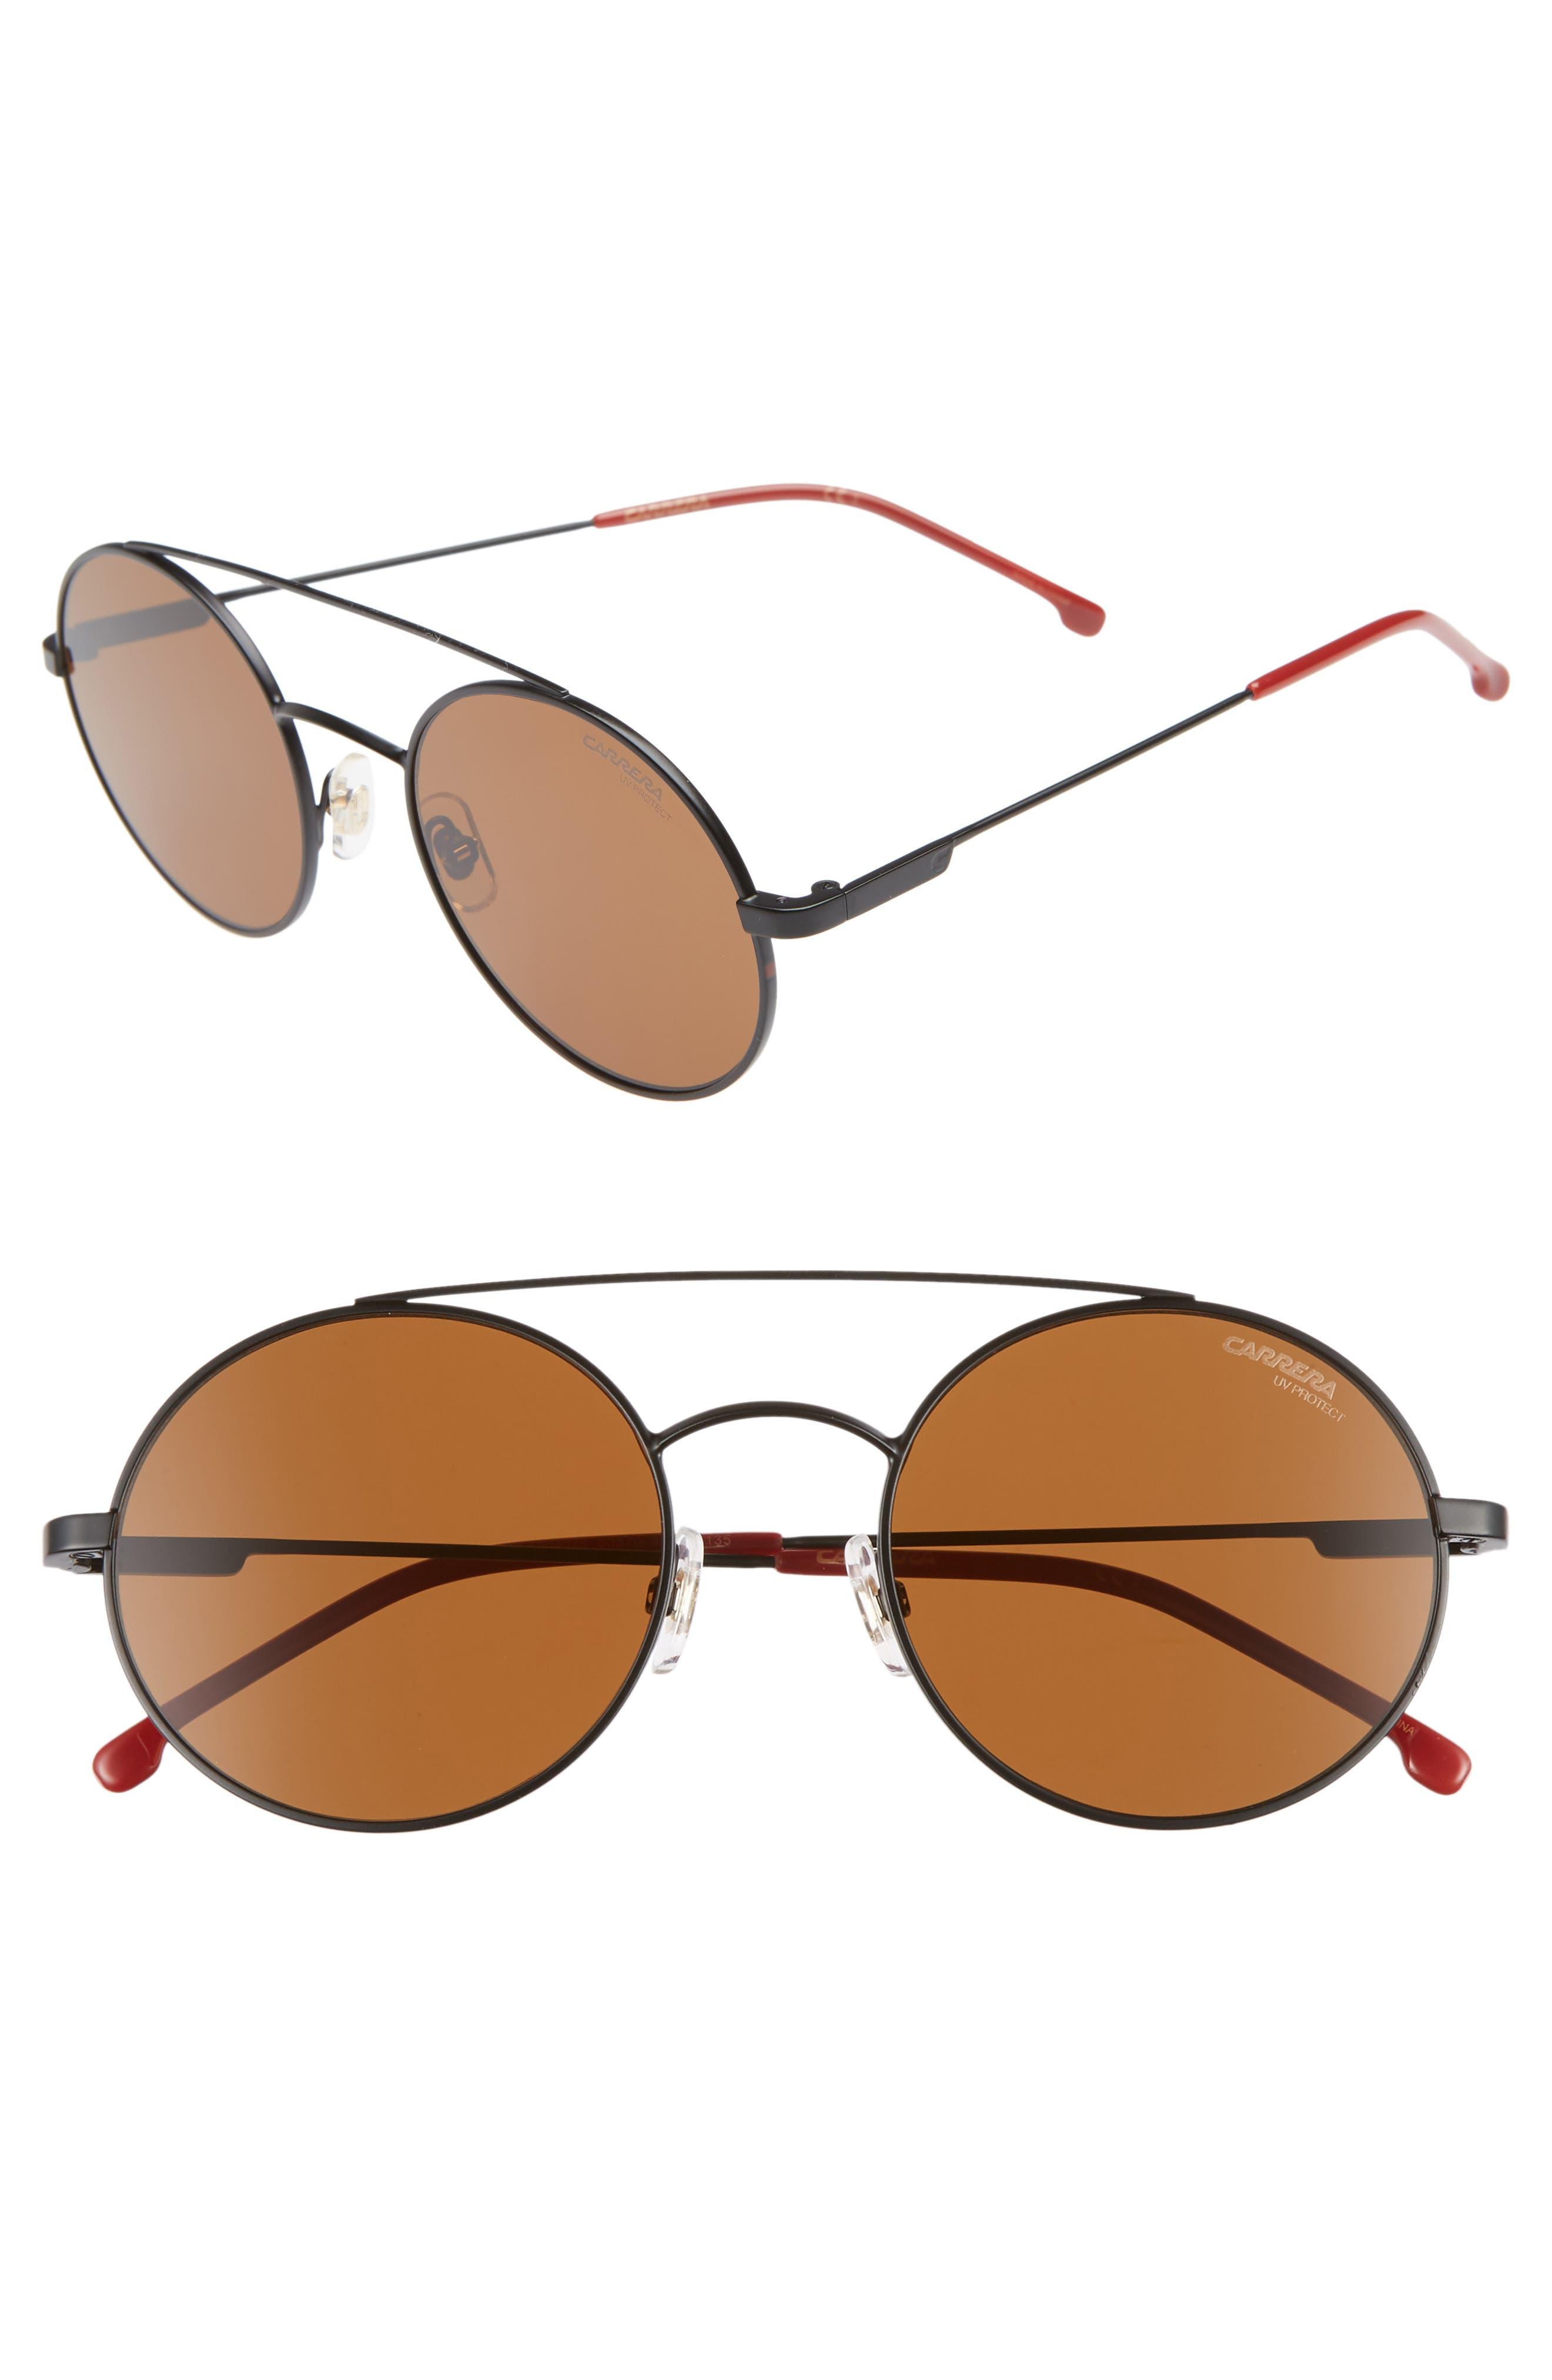 51mm Round Sunglasses,                         Main,                         color, MATTE BLACK